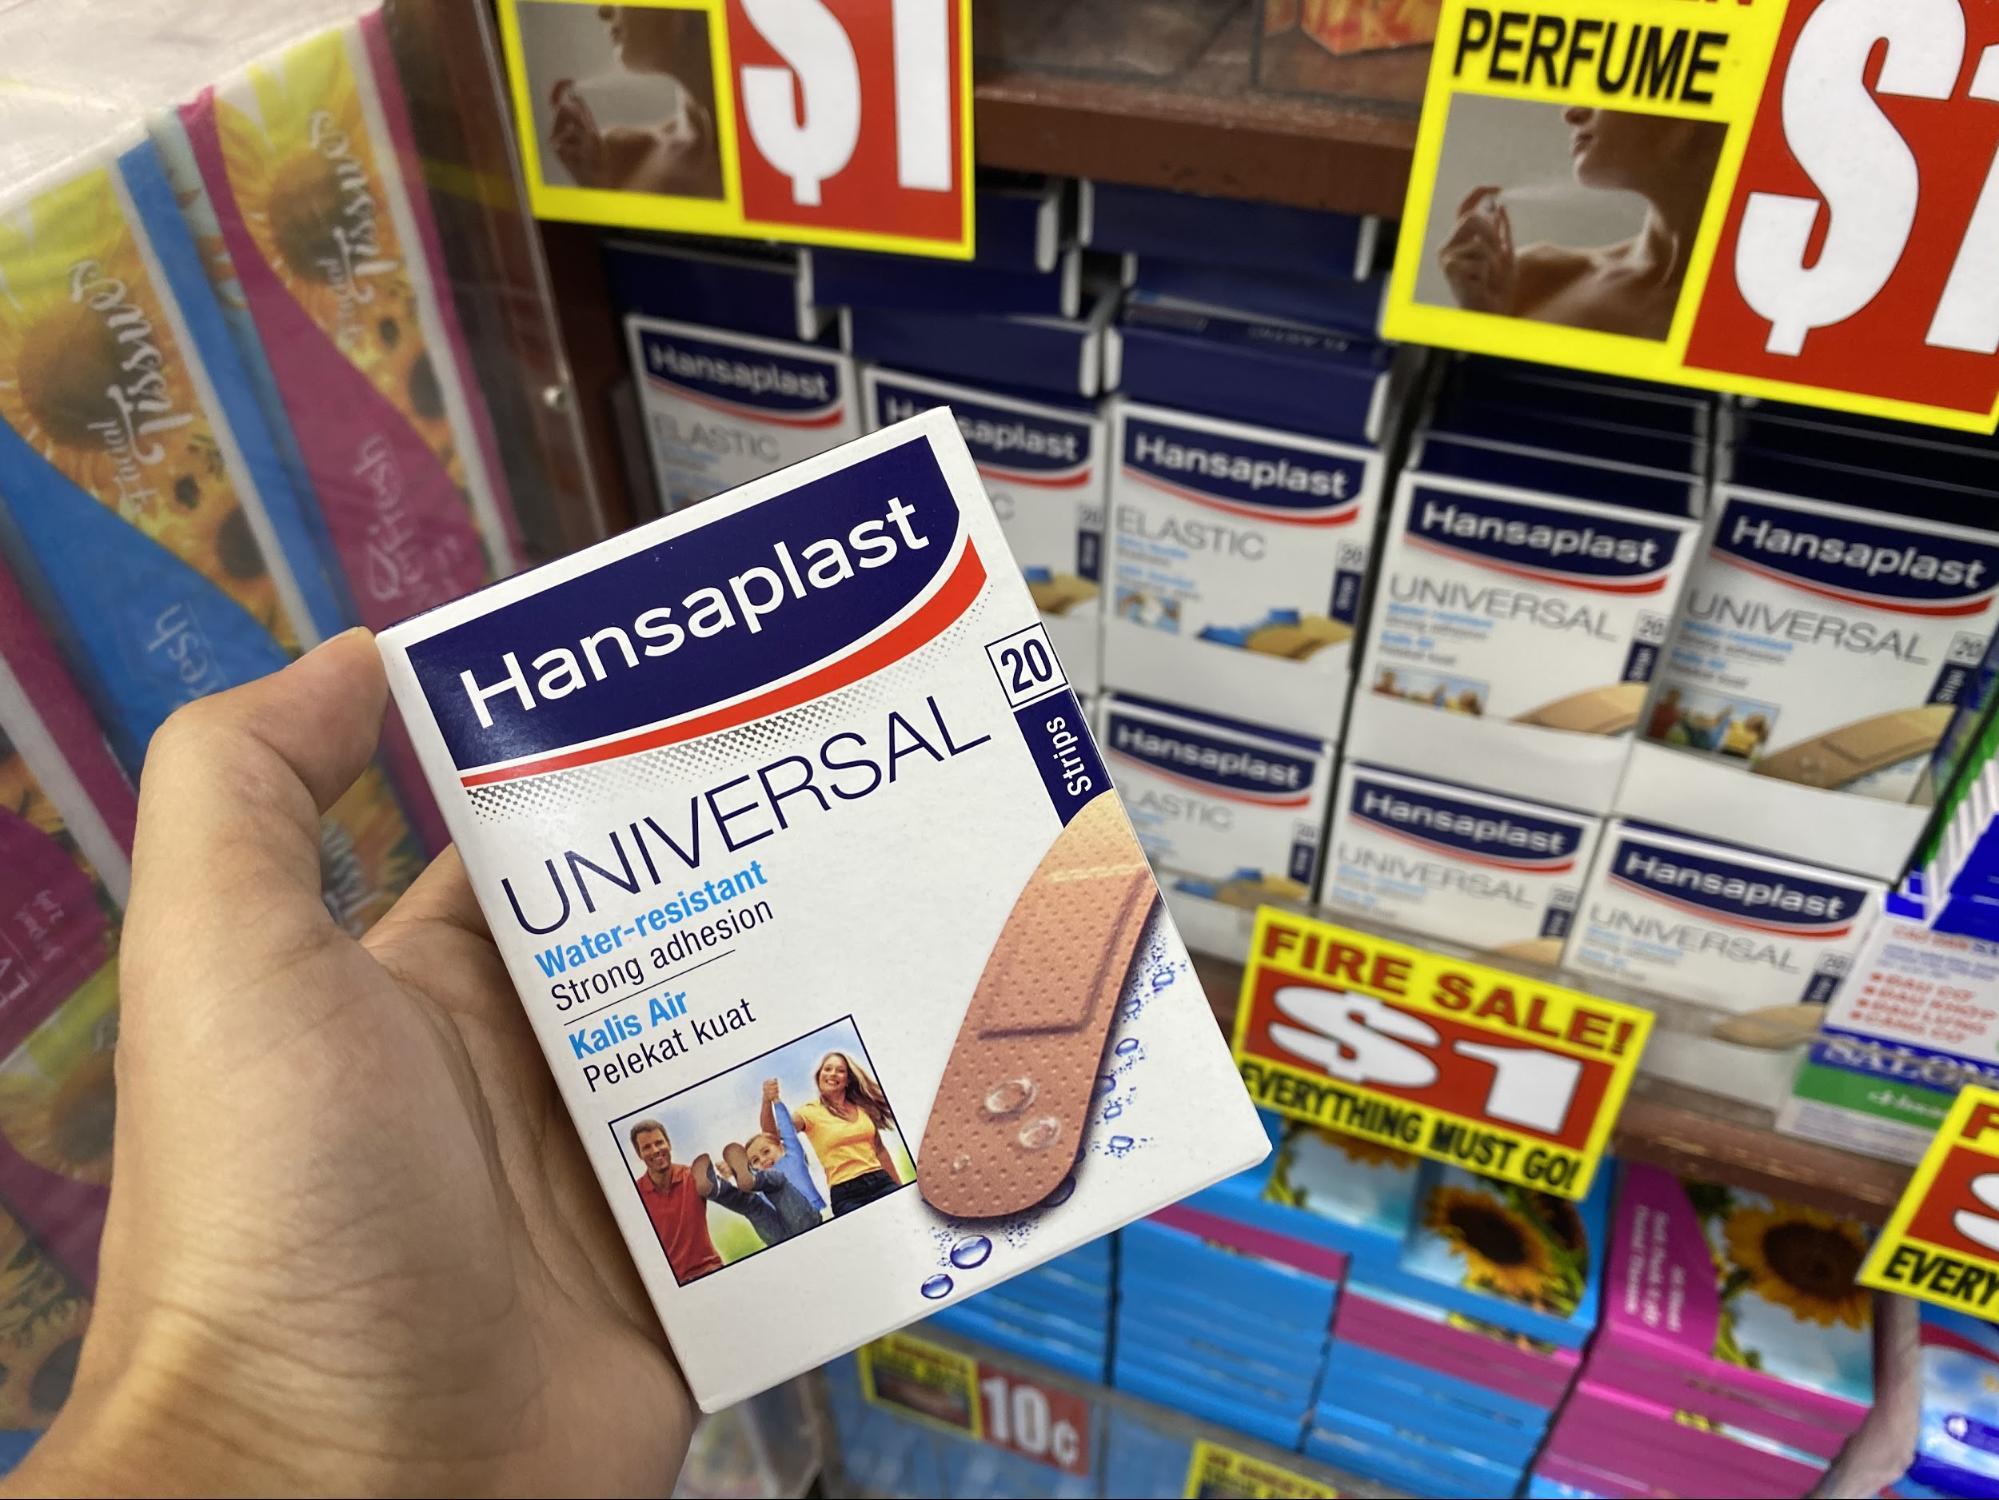 Hansaplast at the Value Dollar store.